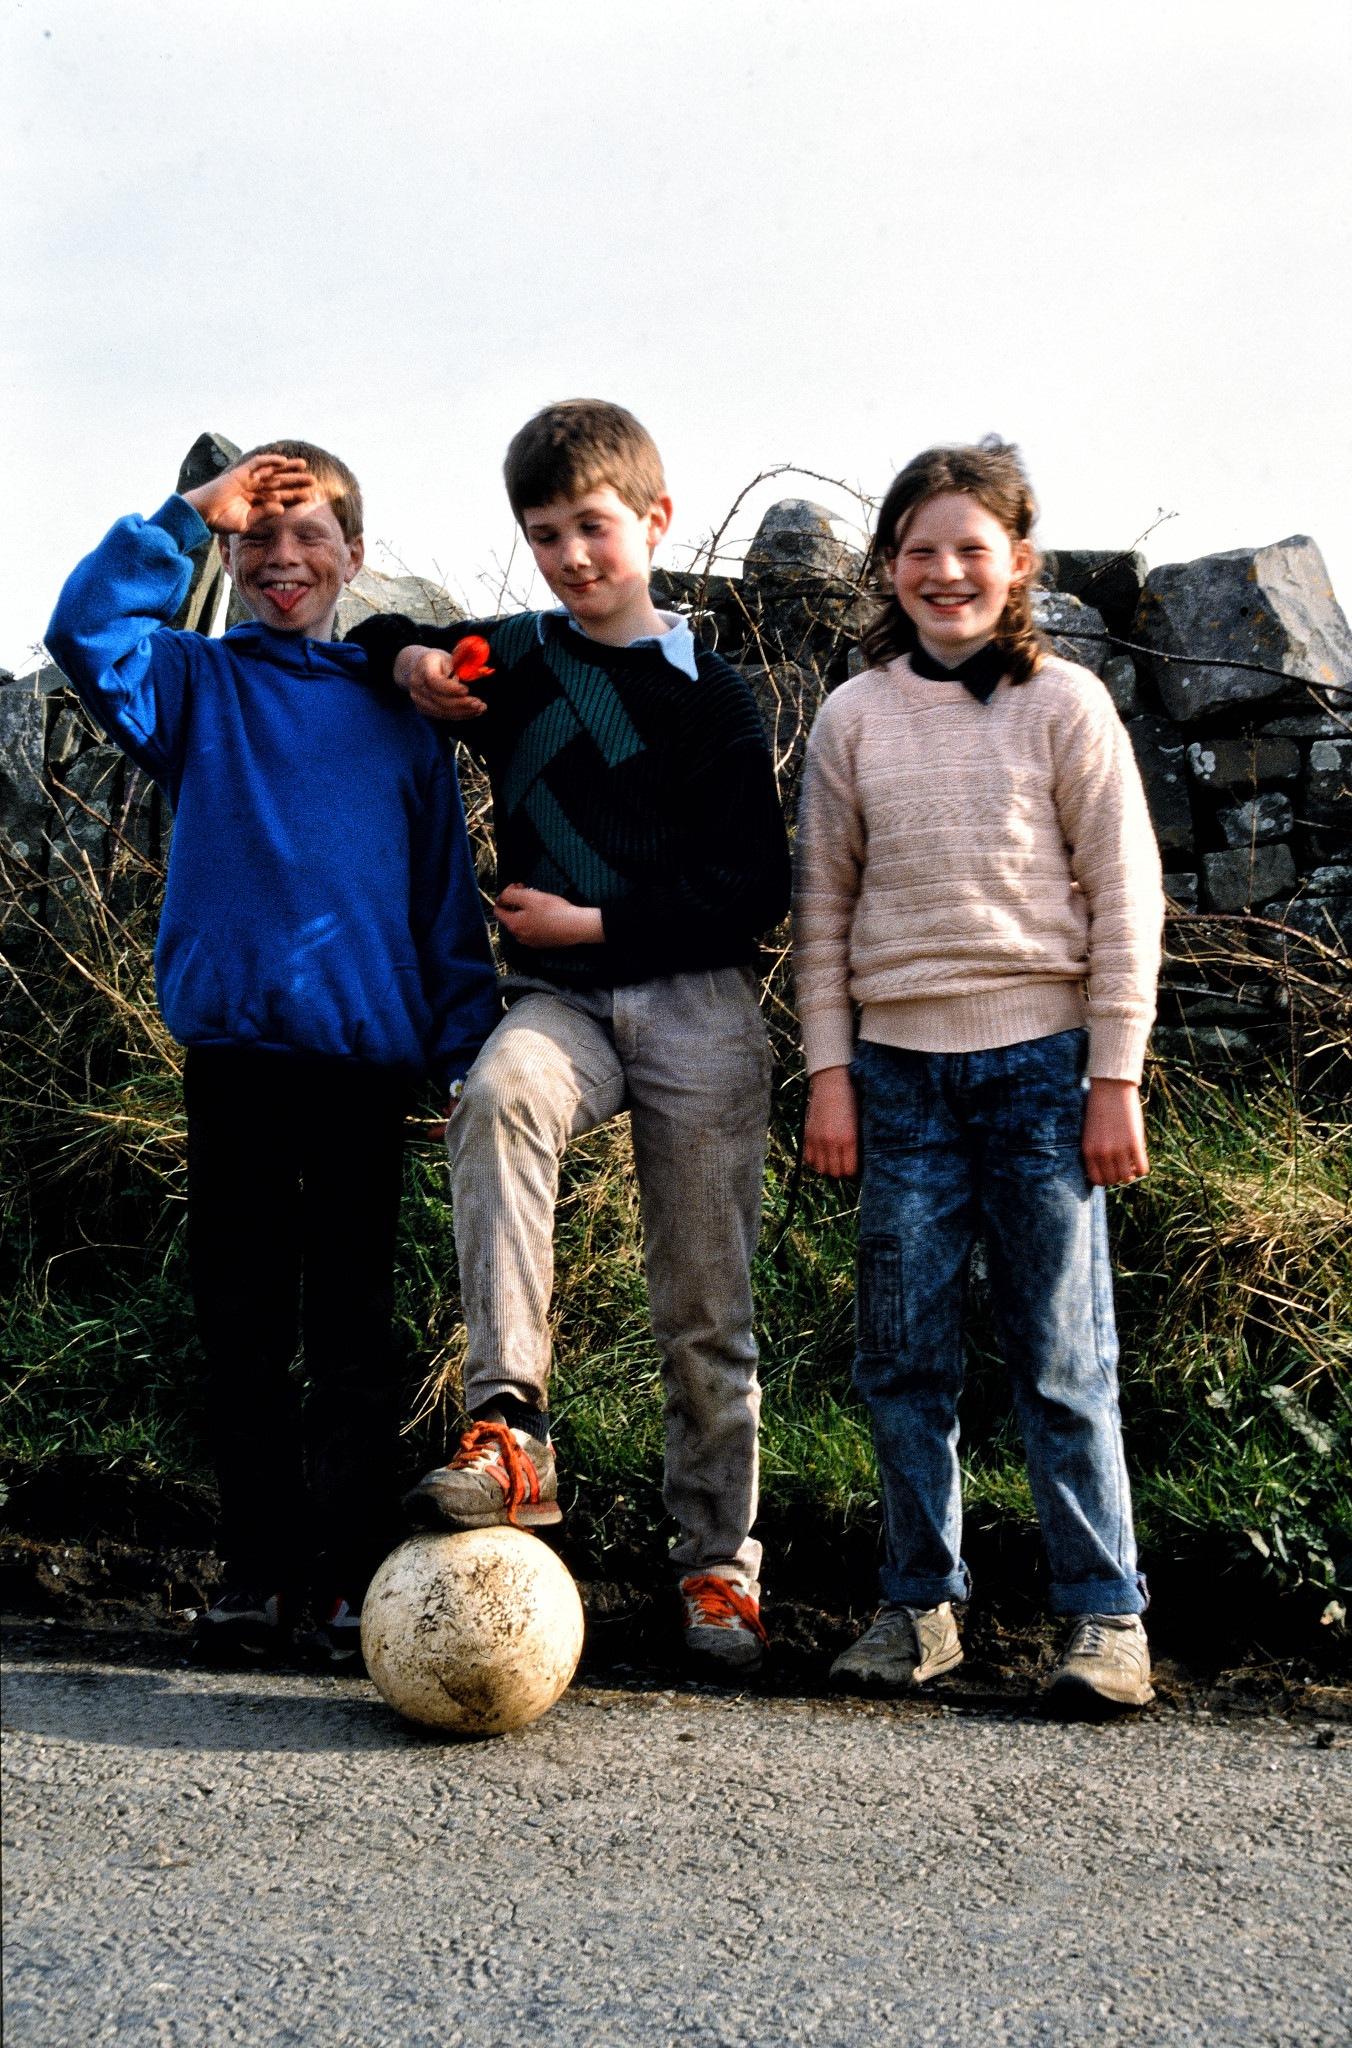 Three Irish kids (1980ies) by Frank Fremerey